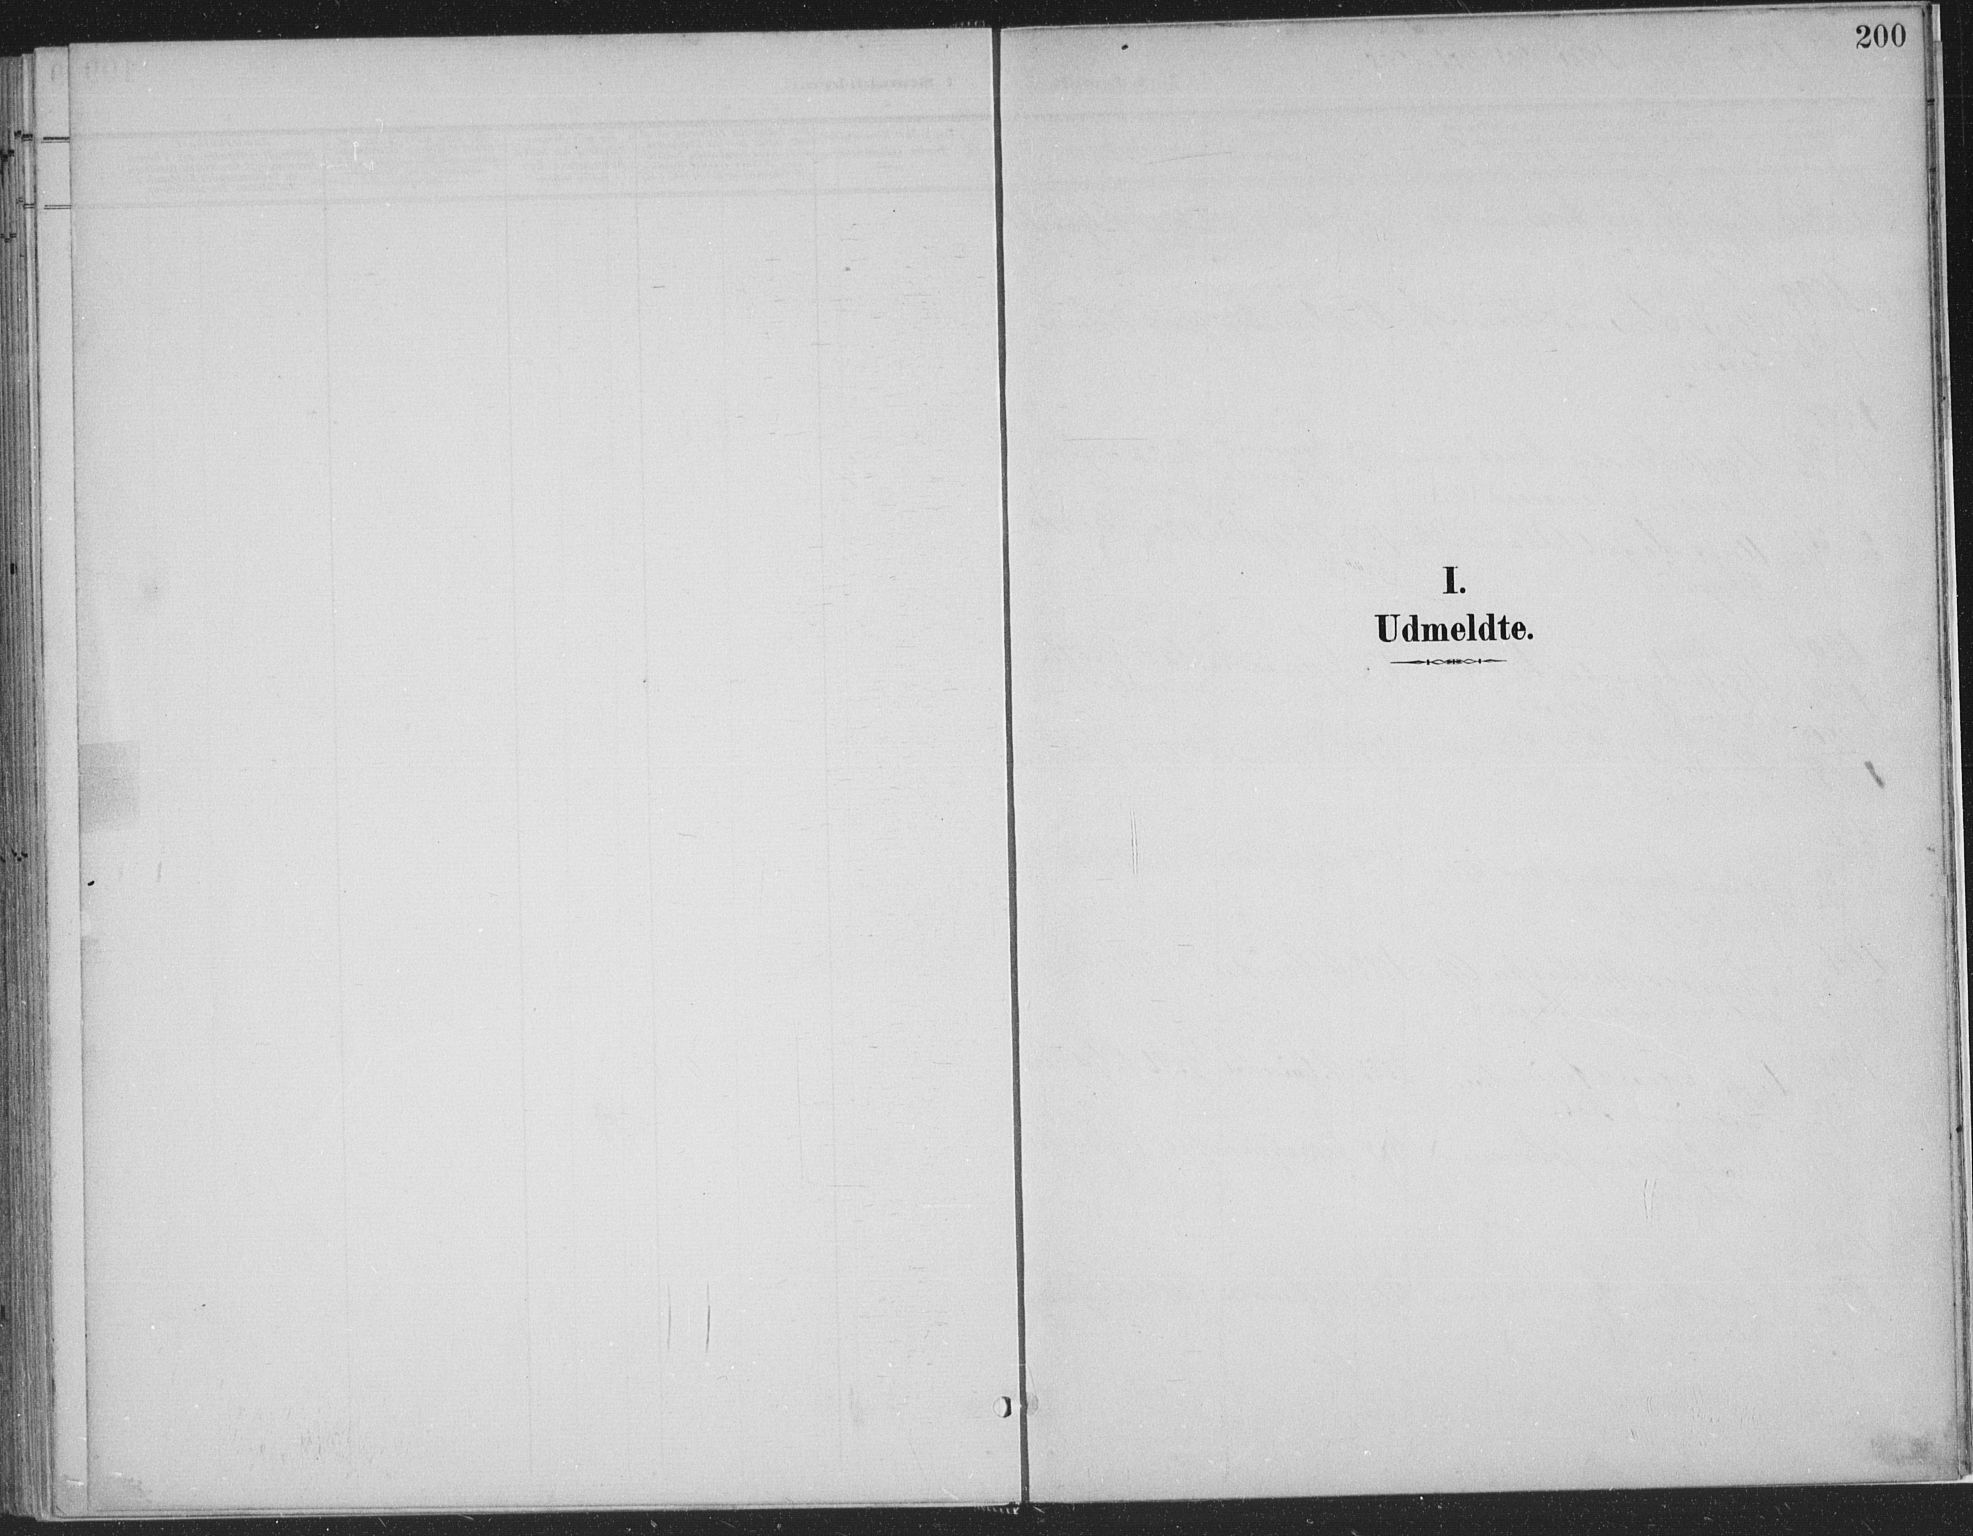 SAH, Østre Gausdal prestekontor, Ministerialbok nr. 4, 1898-1914, s. 200